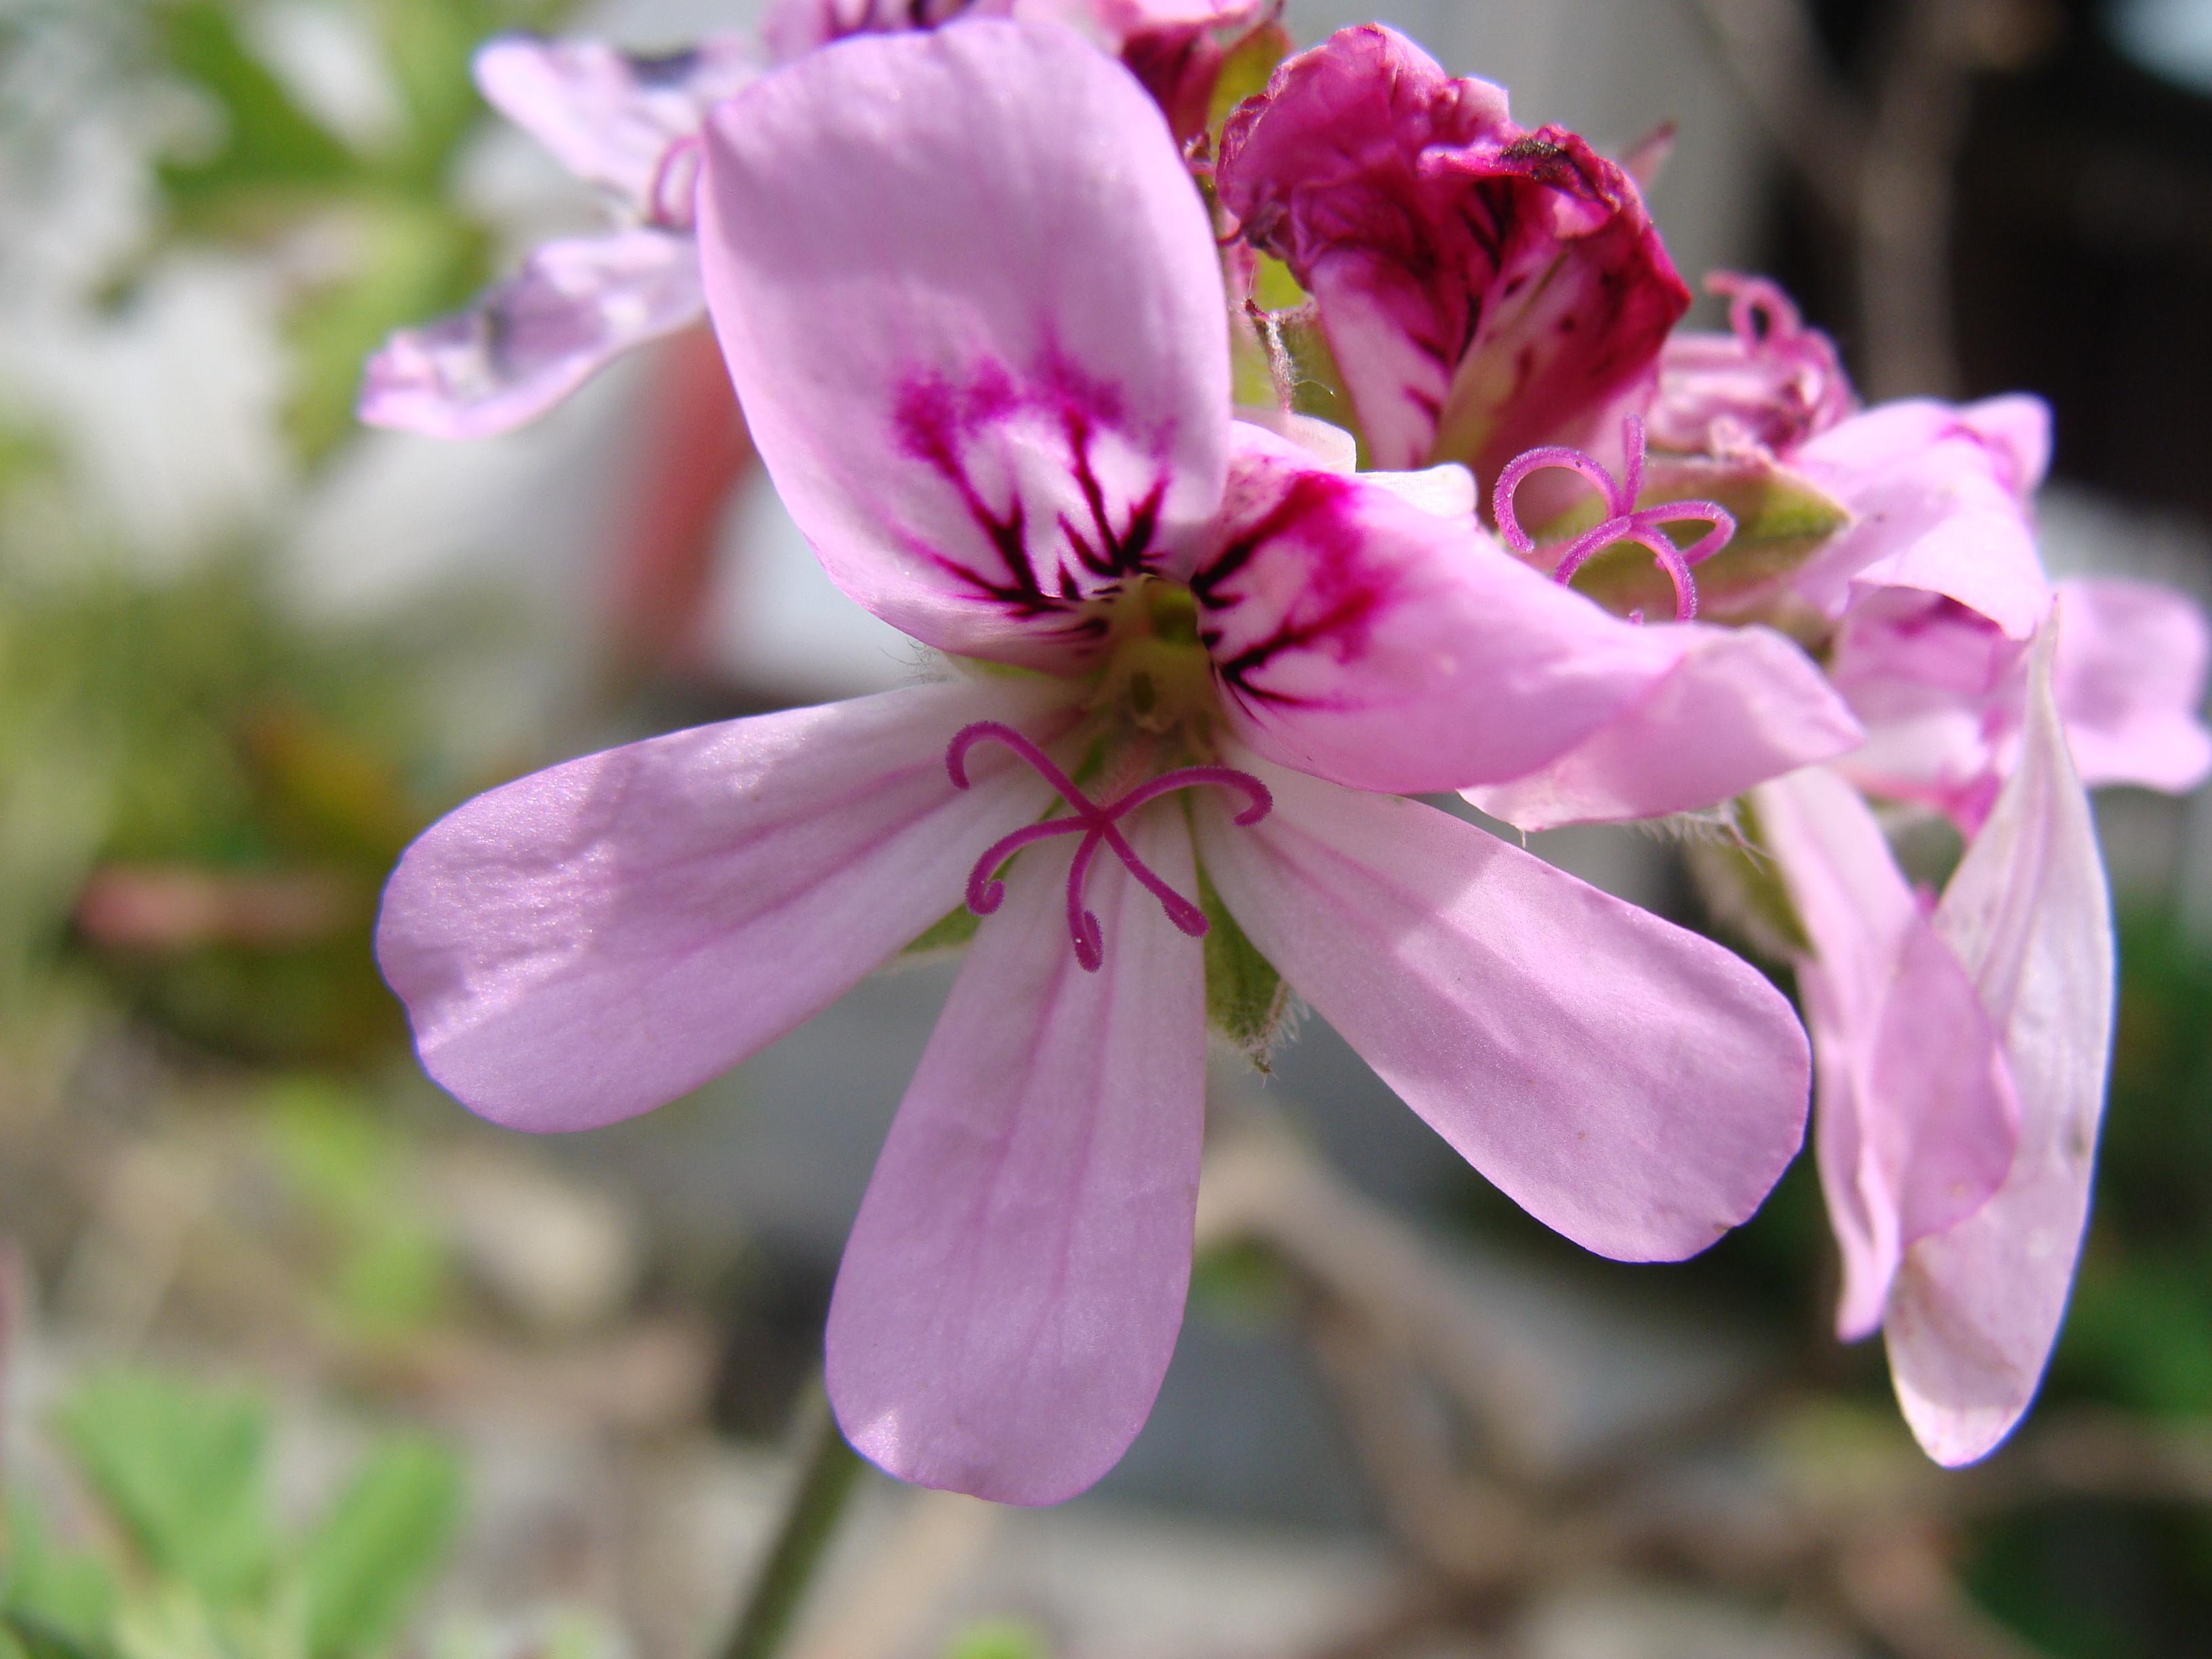 Aceite esencial de geranio – pelargonium graveolens